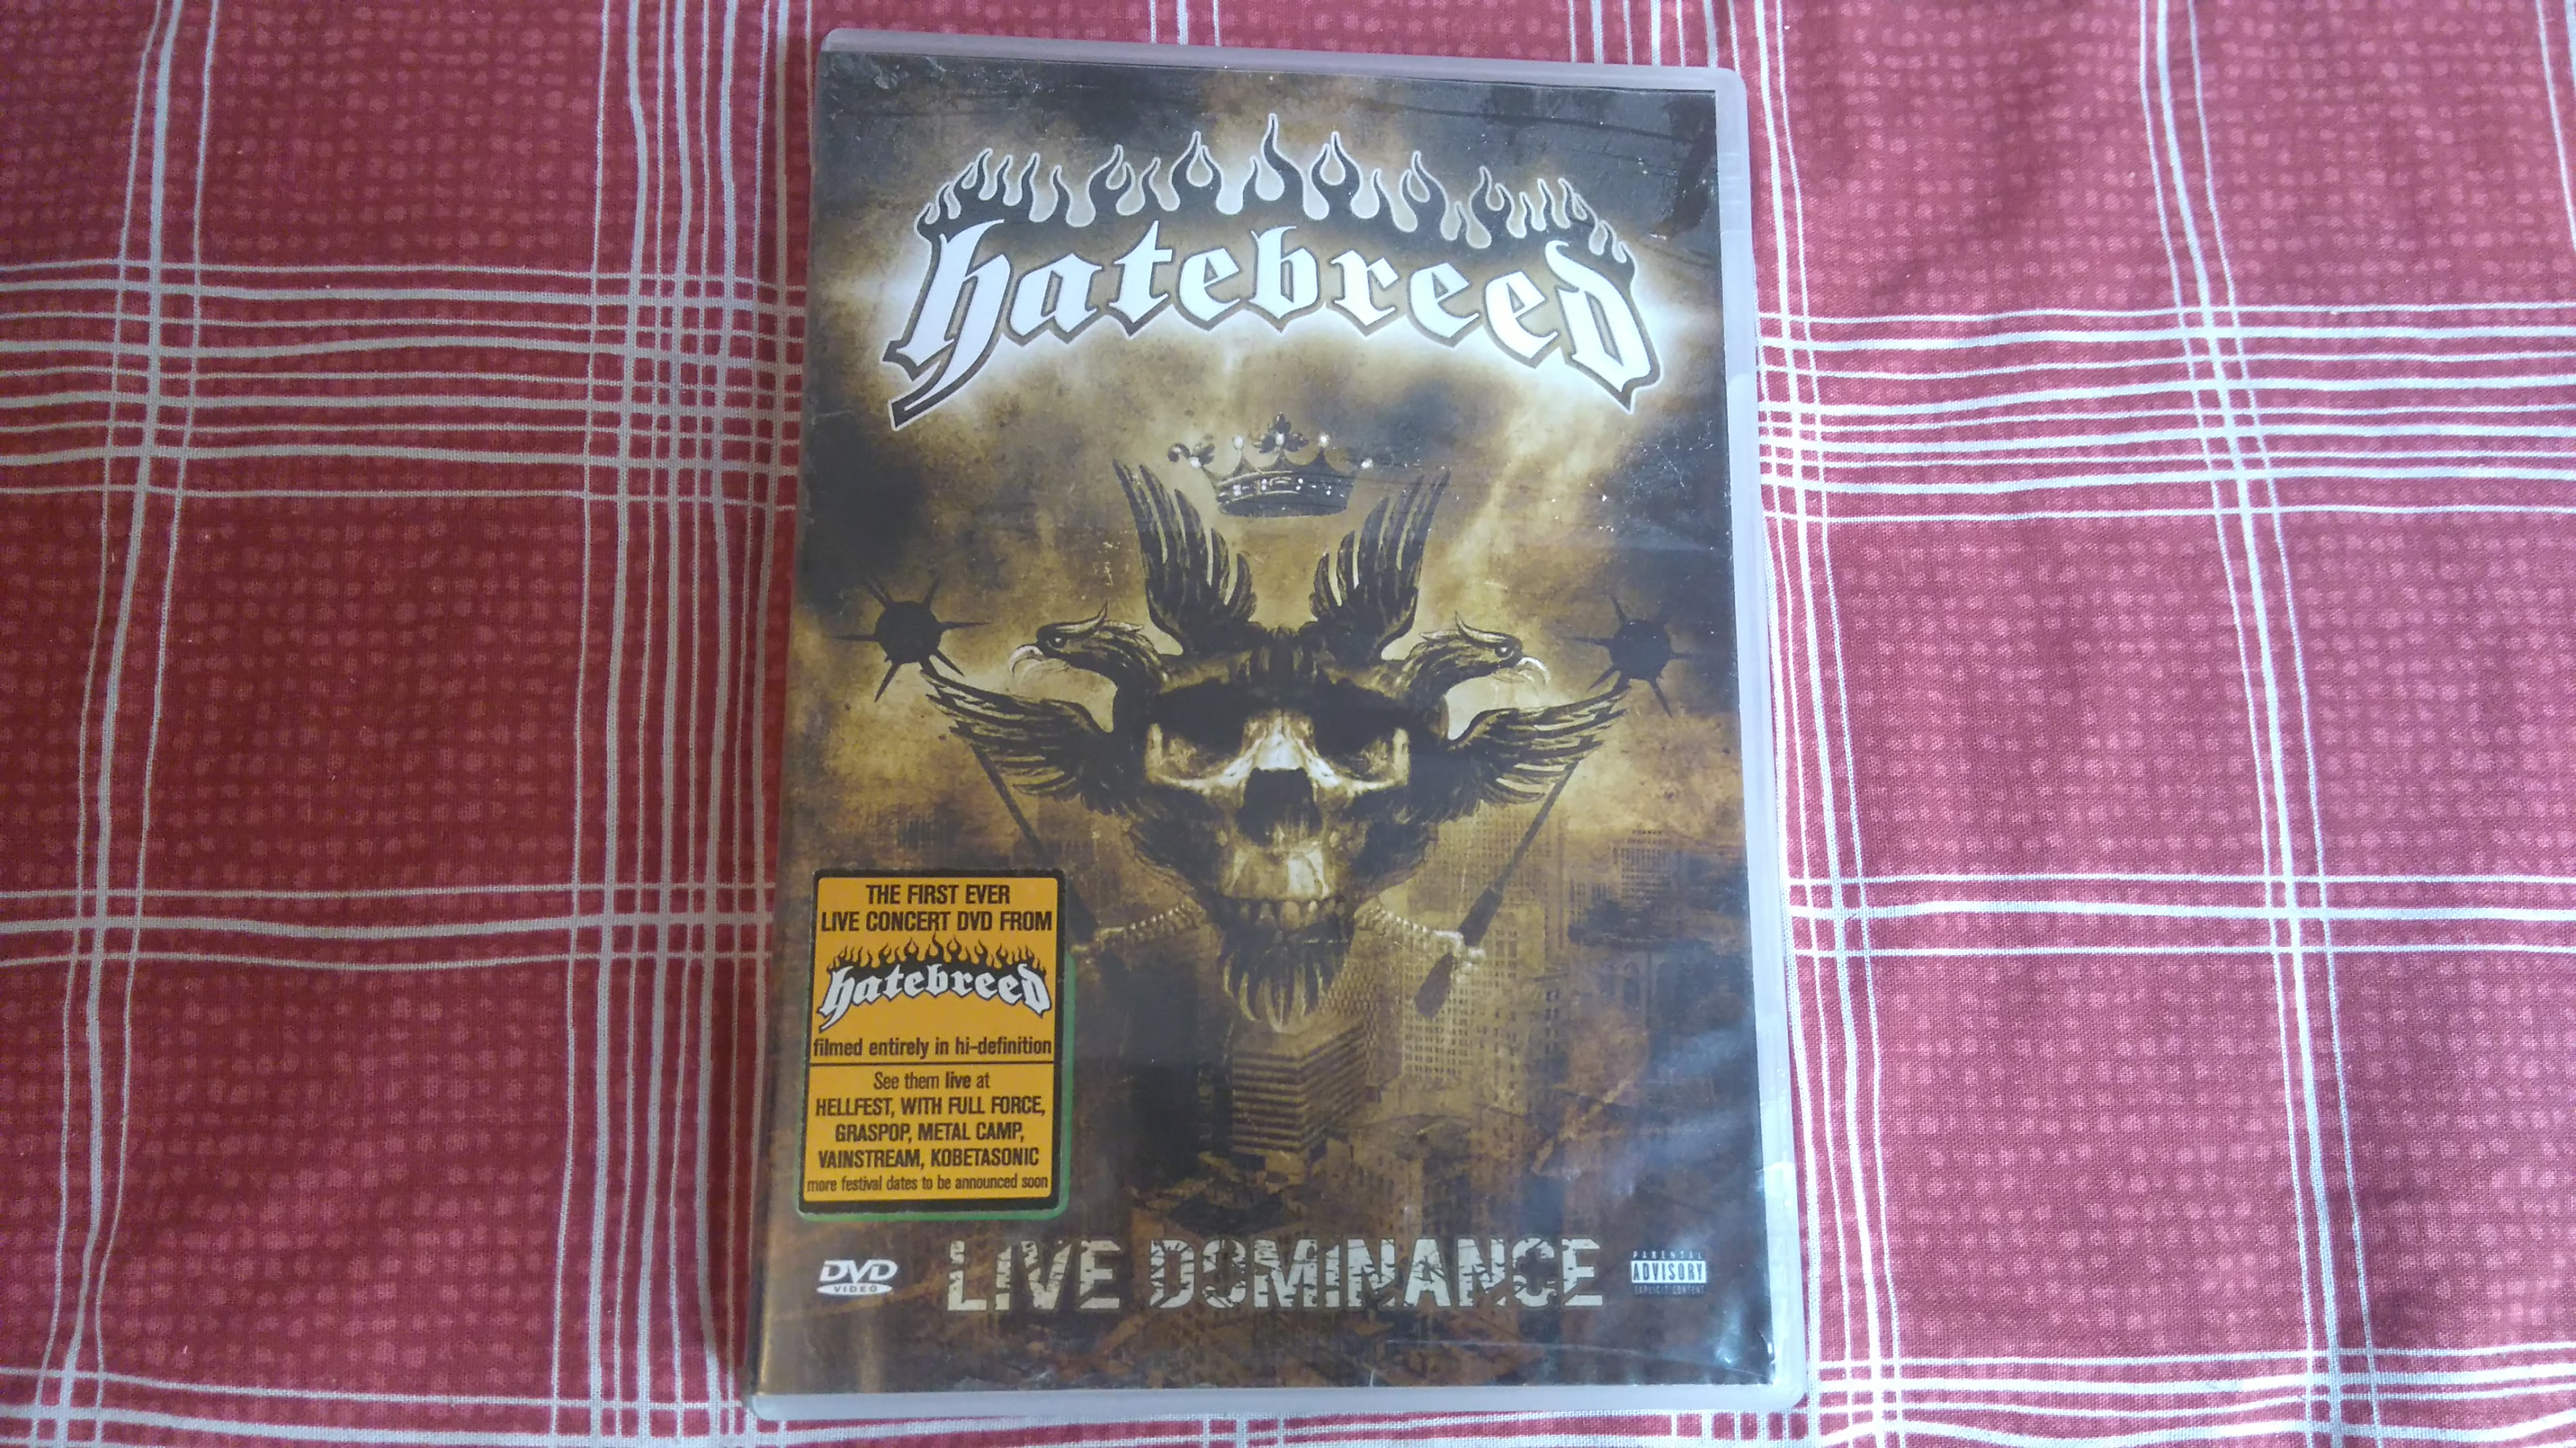 Hatebreed dvd.JPG